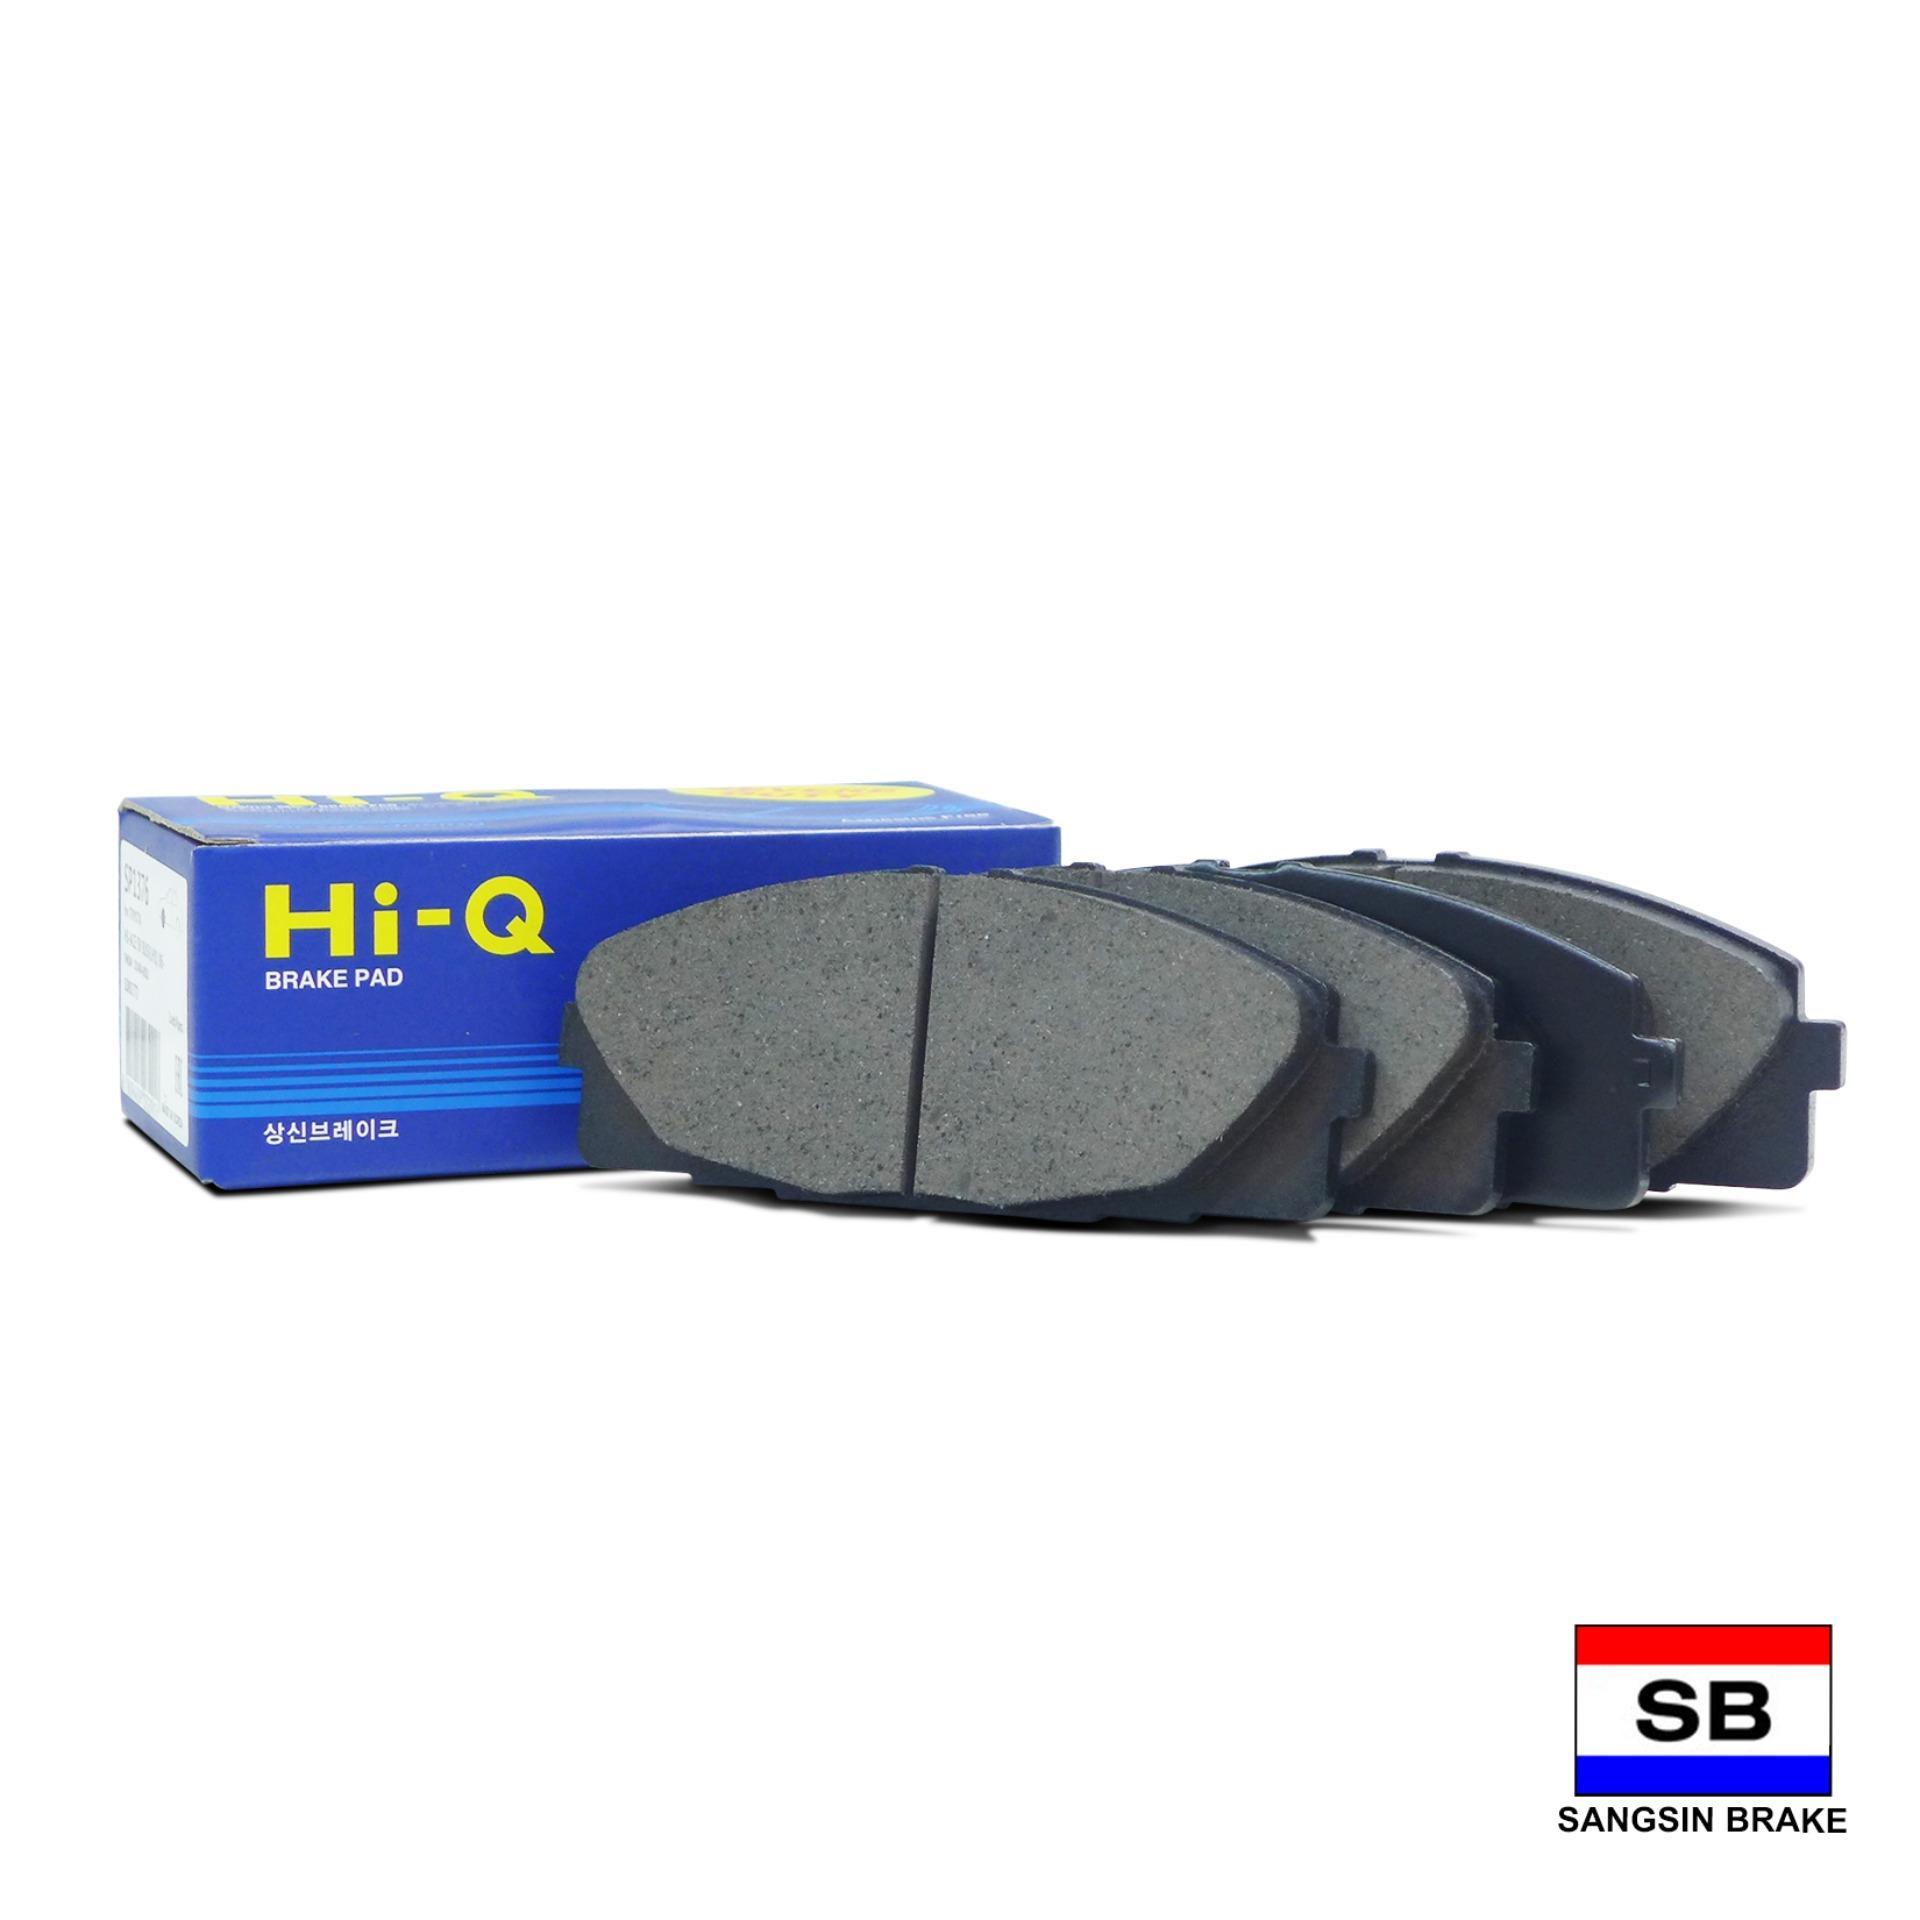 hight resolution of hi q front brake pads for toyota hi ace v grandia super grandia